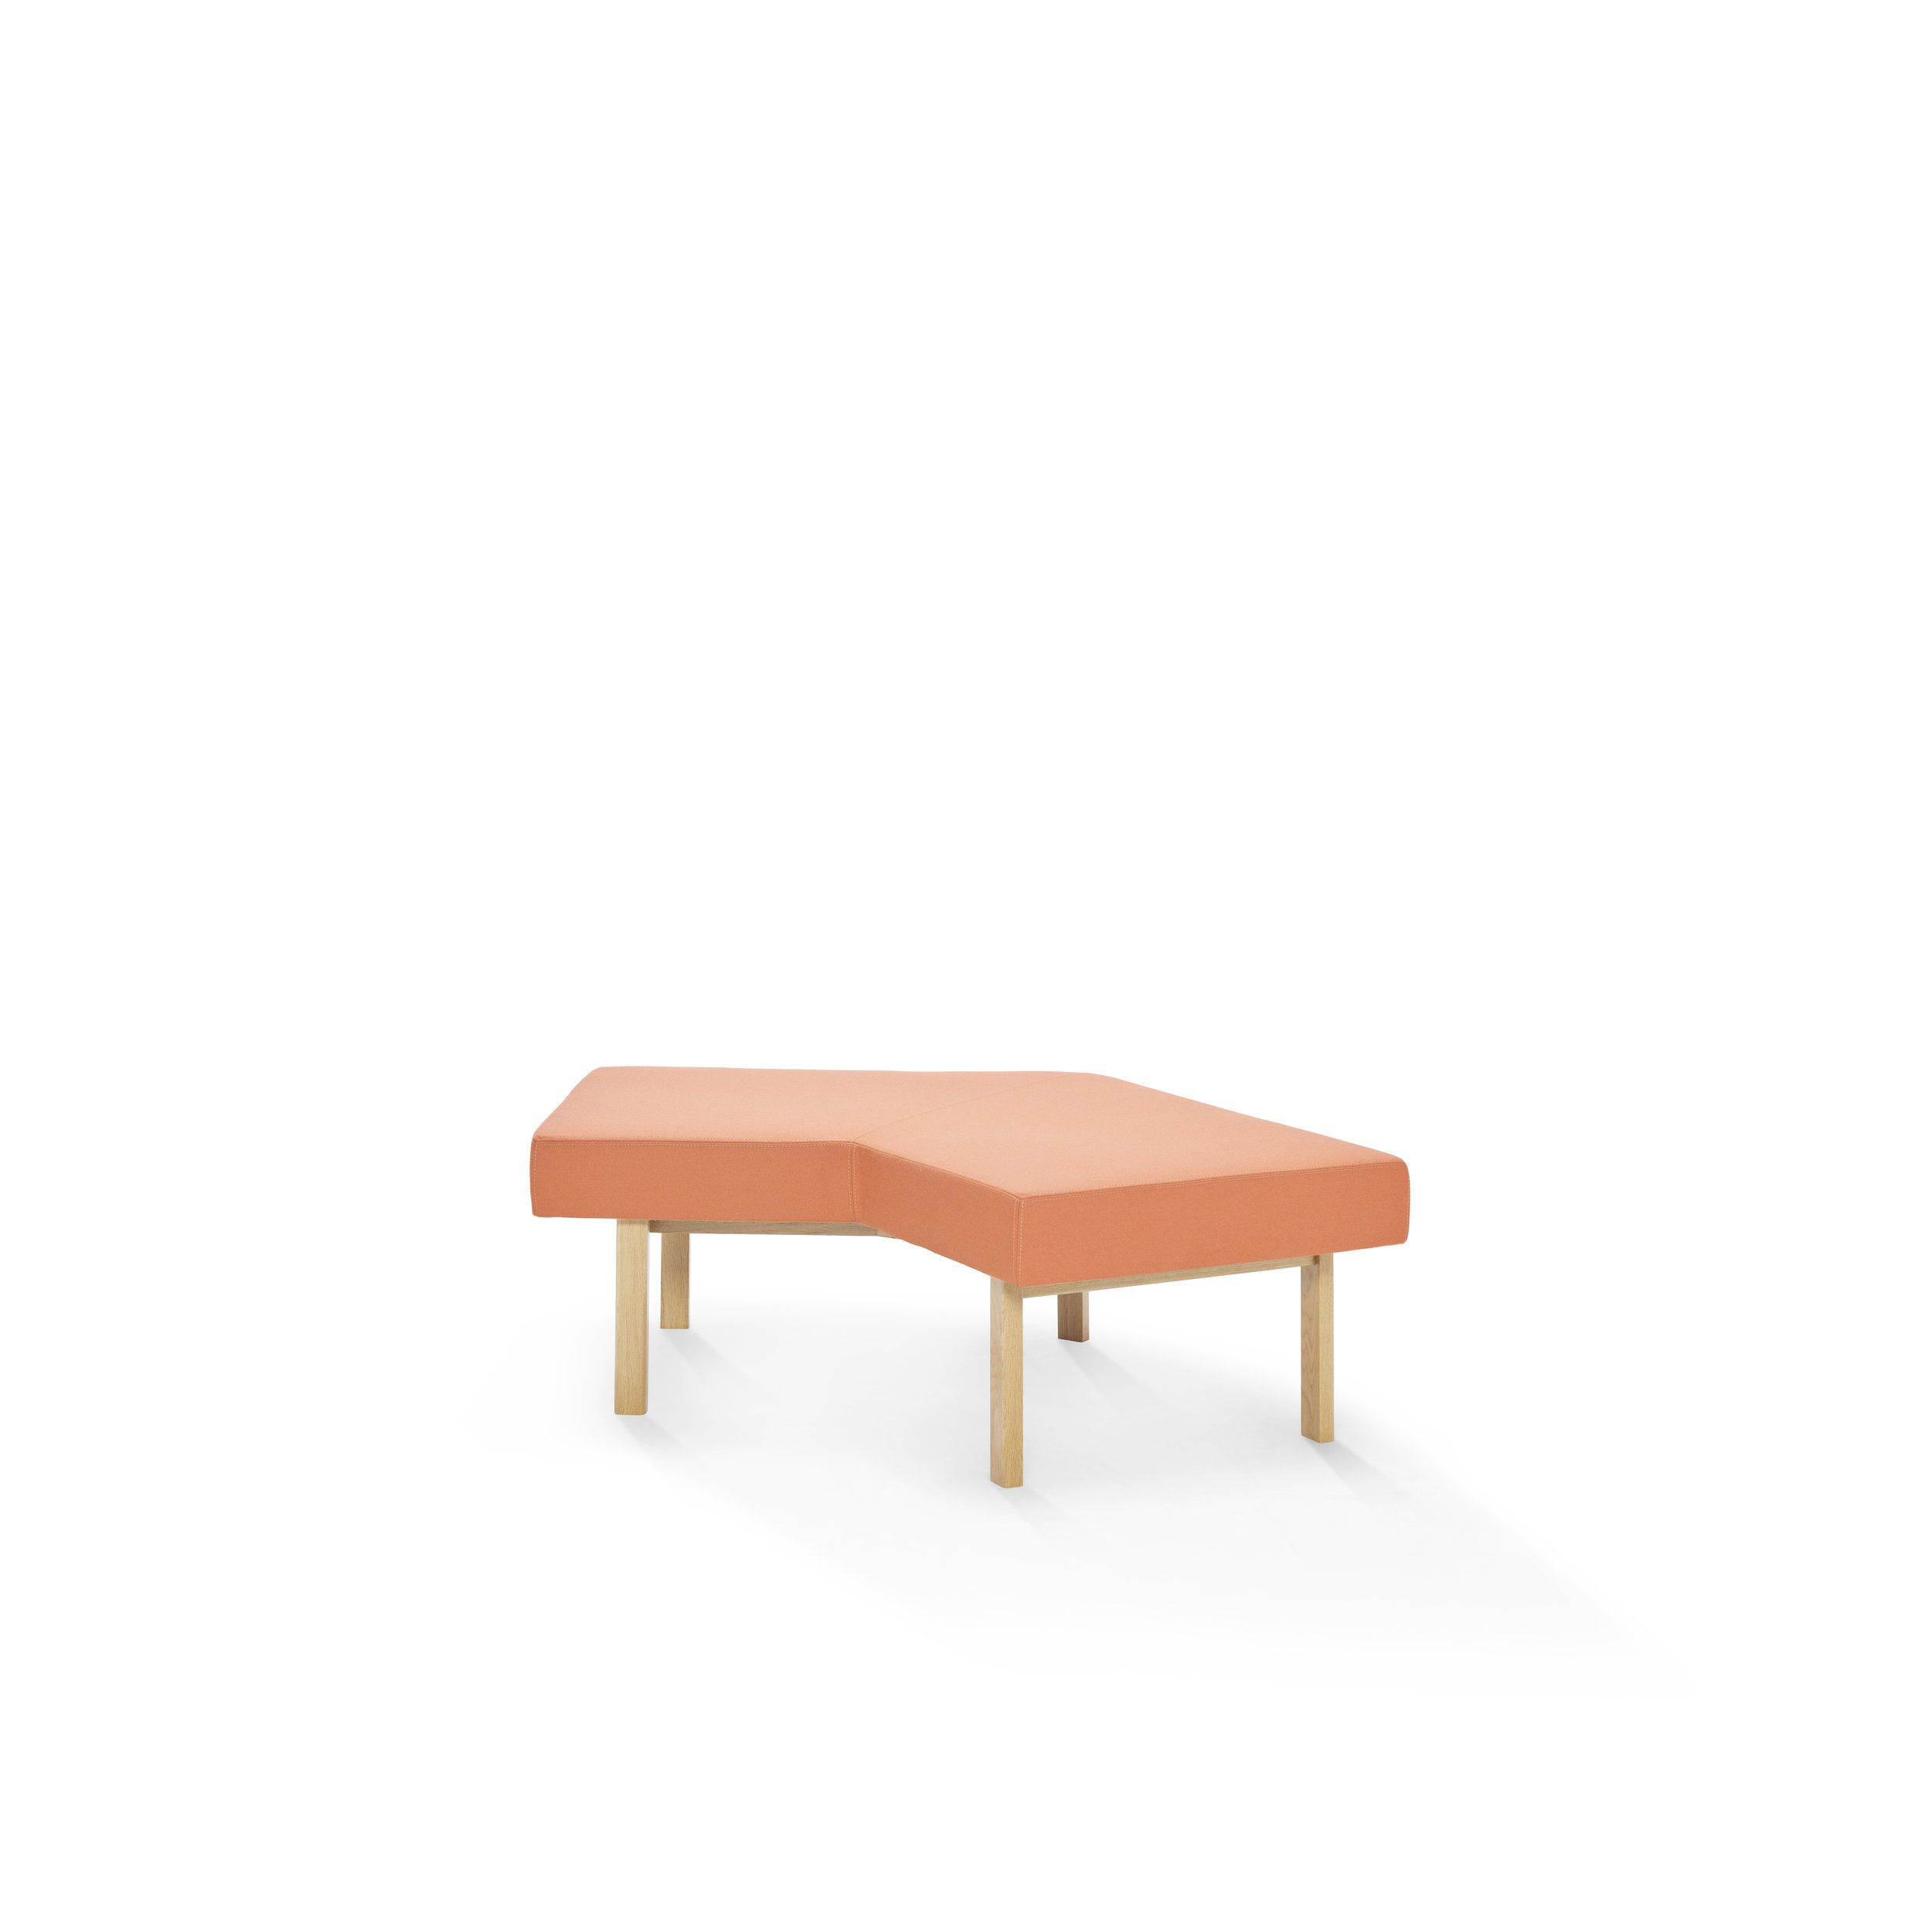 Homework—angled bench  3fe870cfe5ed4